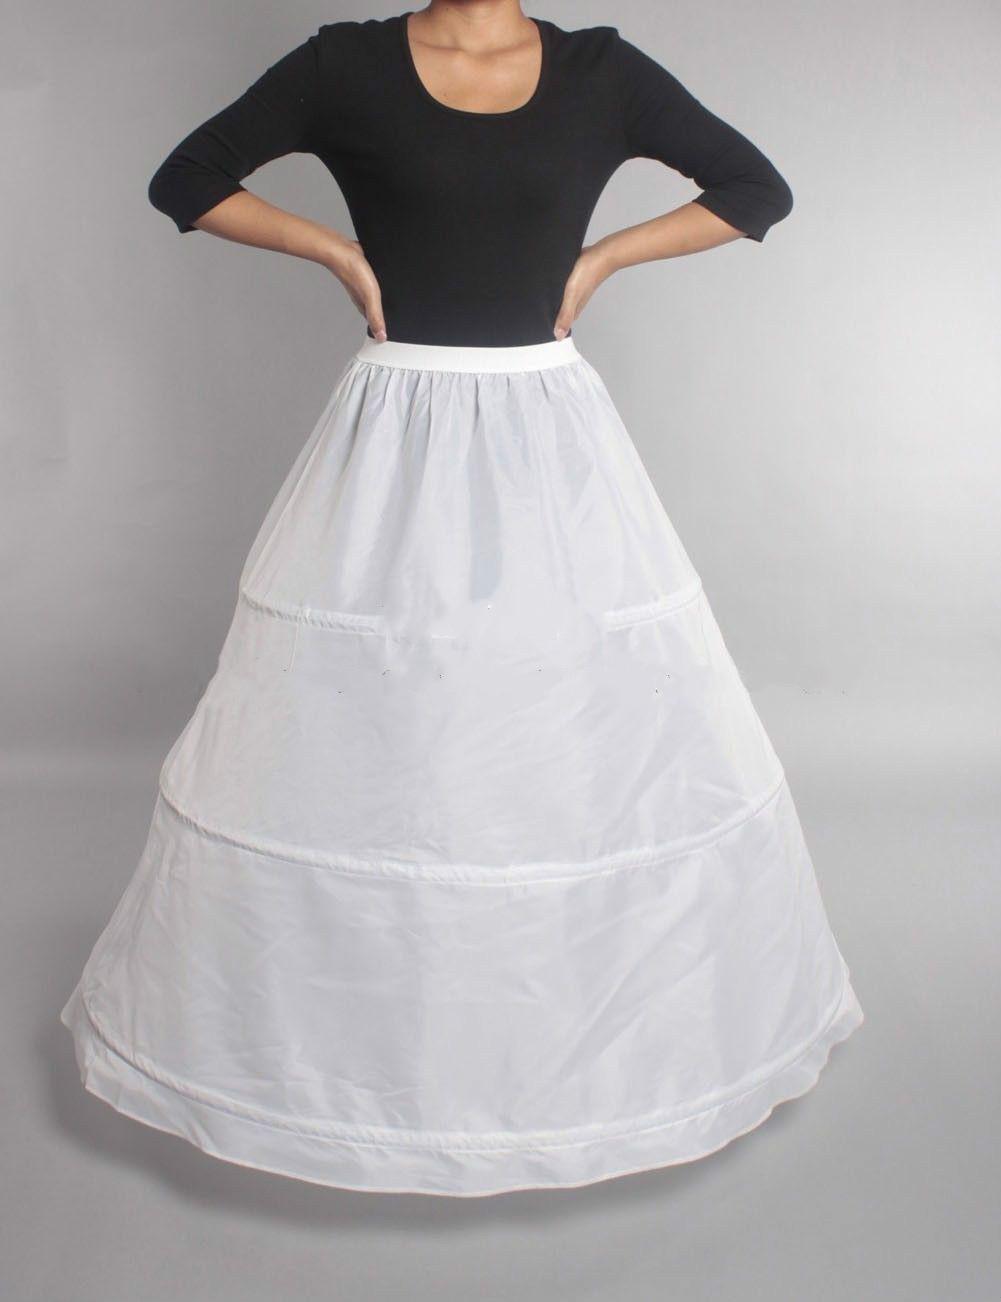 43db0967cac21 White 2 Hoop Bridal Wedding Petticoat Underskirt Prom Skirt Crinoline Slip  Skirt Wedding Gown Petticoat White Petticoats From Shygb1114, $12.07|  DHgate.Com